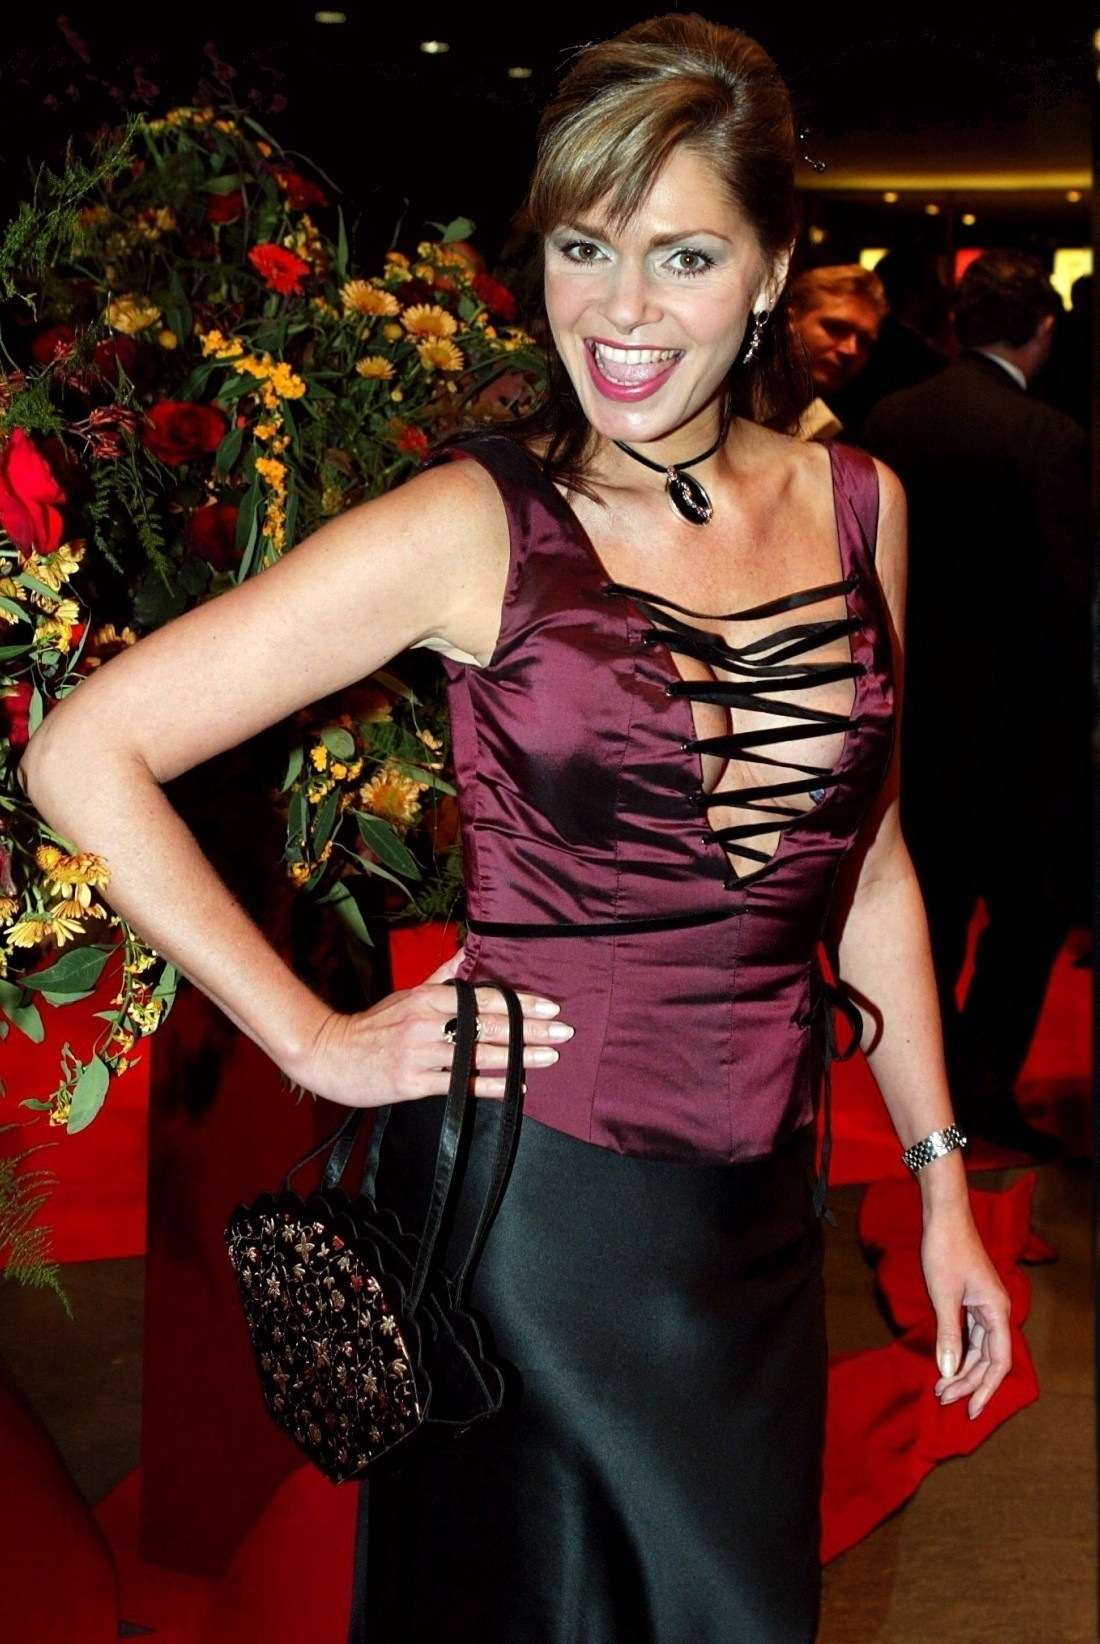 Maren Gilzer Nude » SexyStars.online - Hottest Celebrity